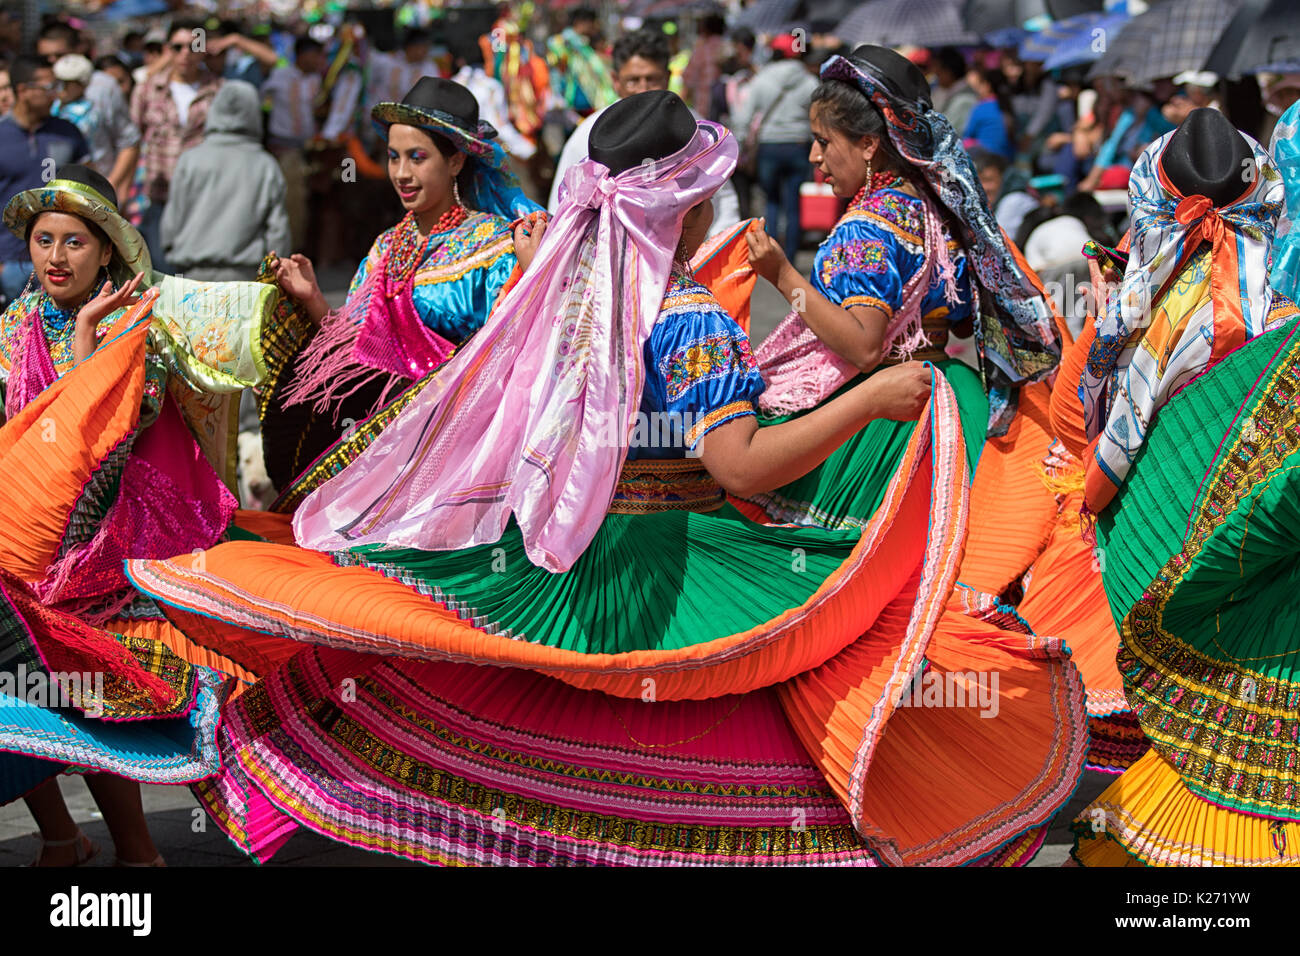 June 17, 2017 Pujili, Ecuador:traditional female dress details worn at the Corpus Christi annual parade - Stock Image